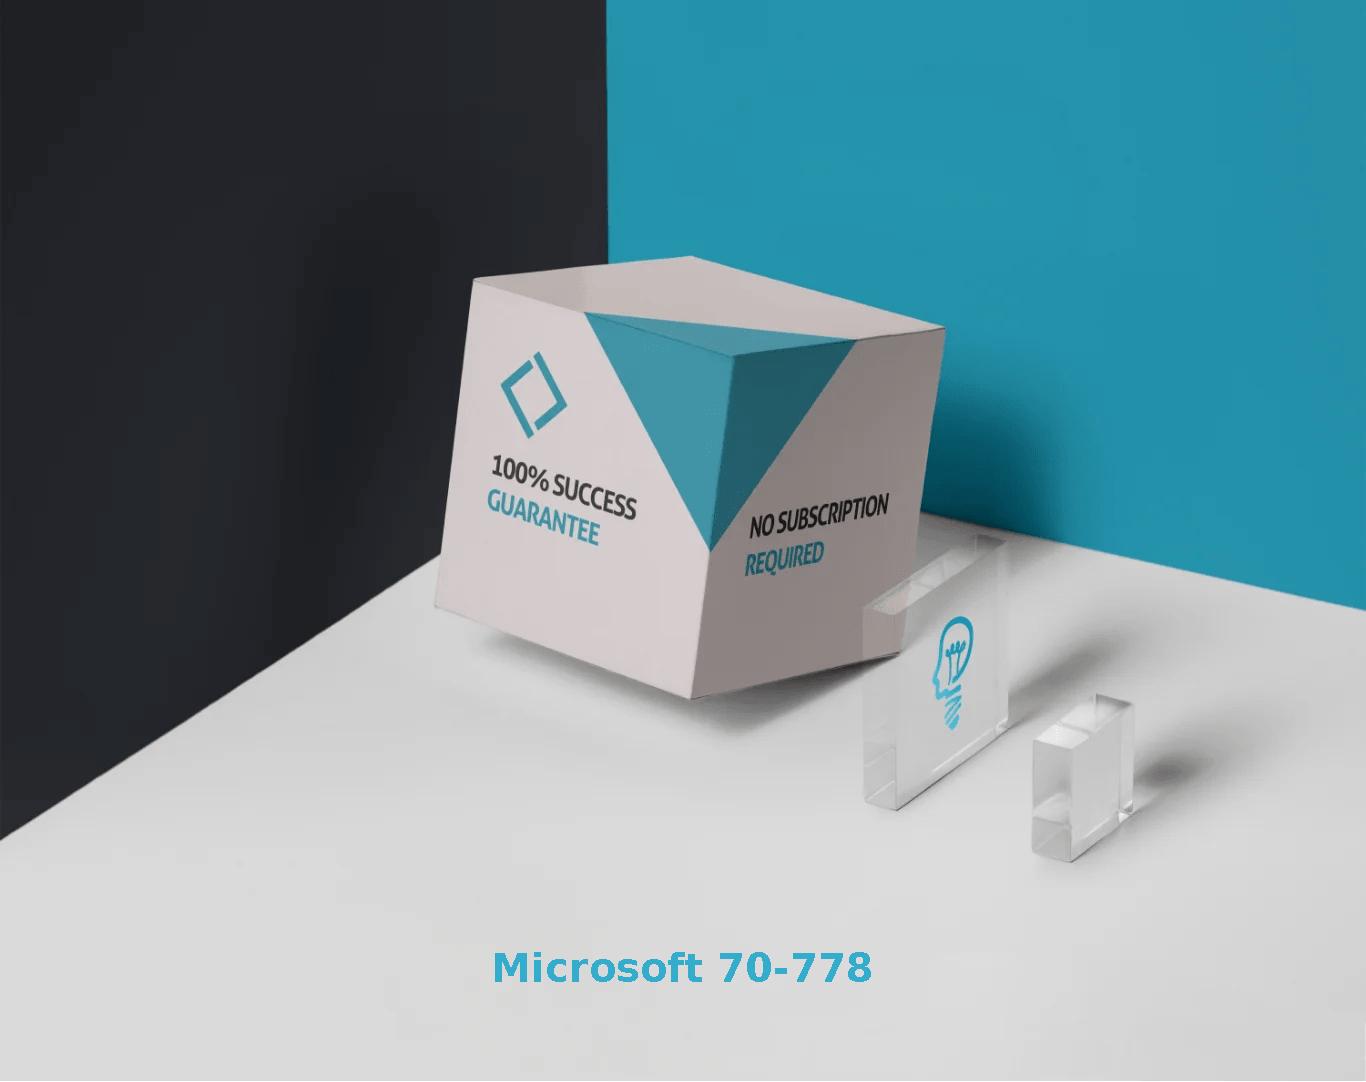 Microsoft 70-778 Exams